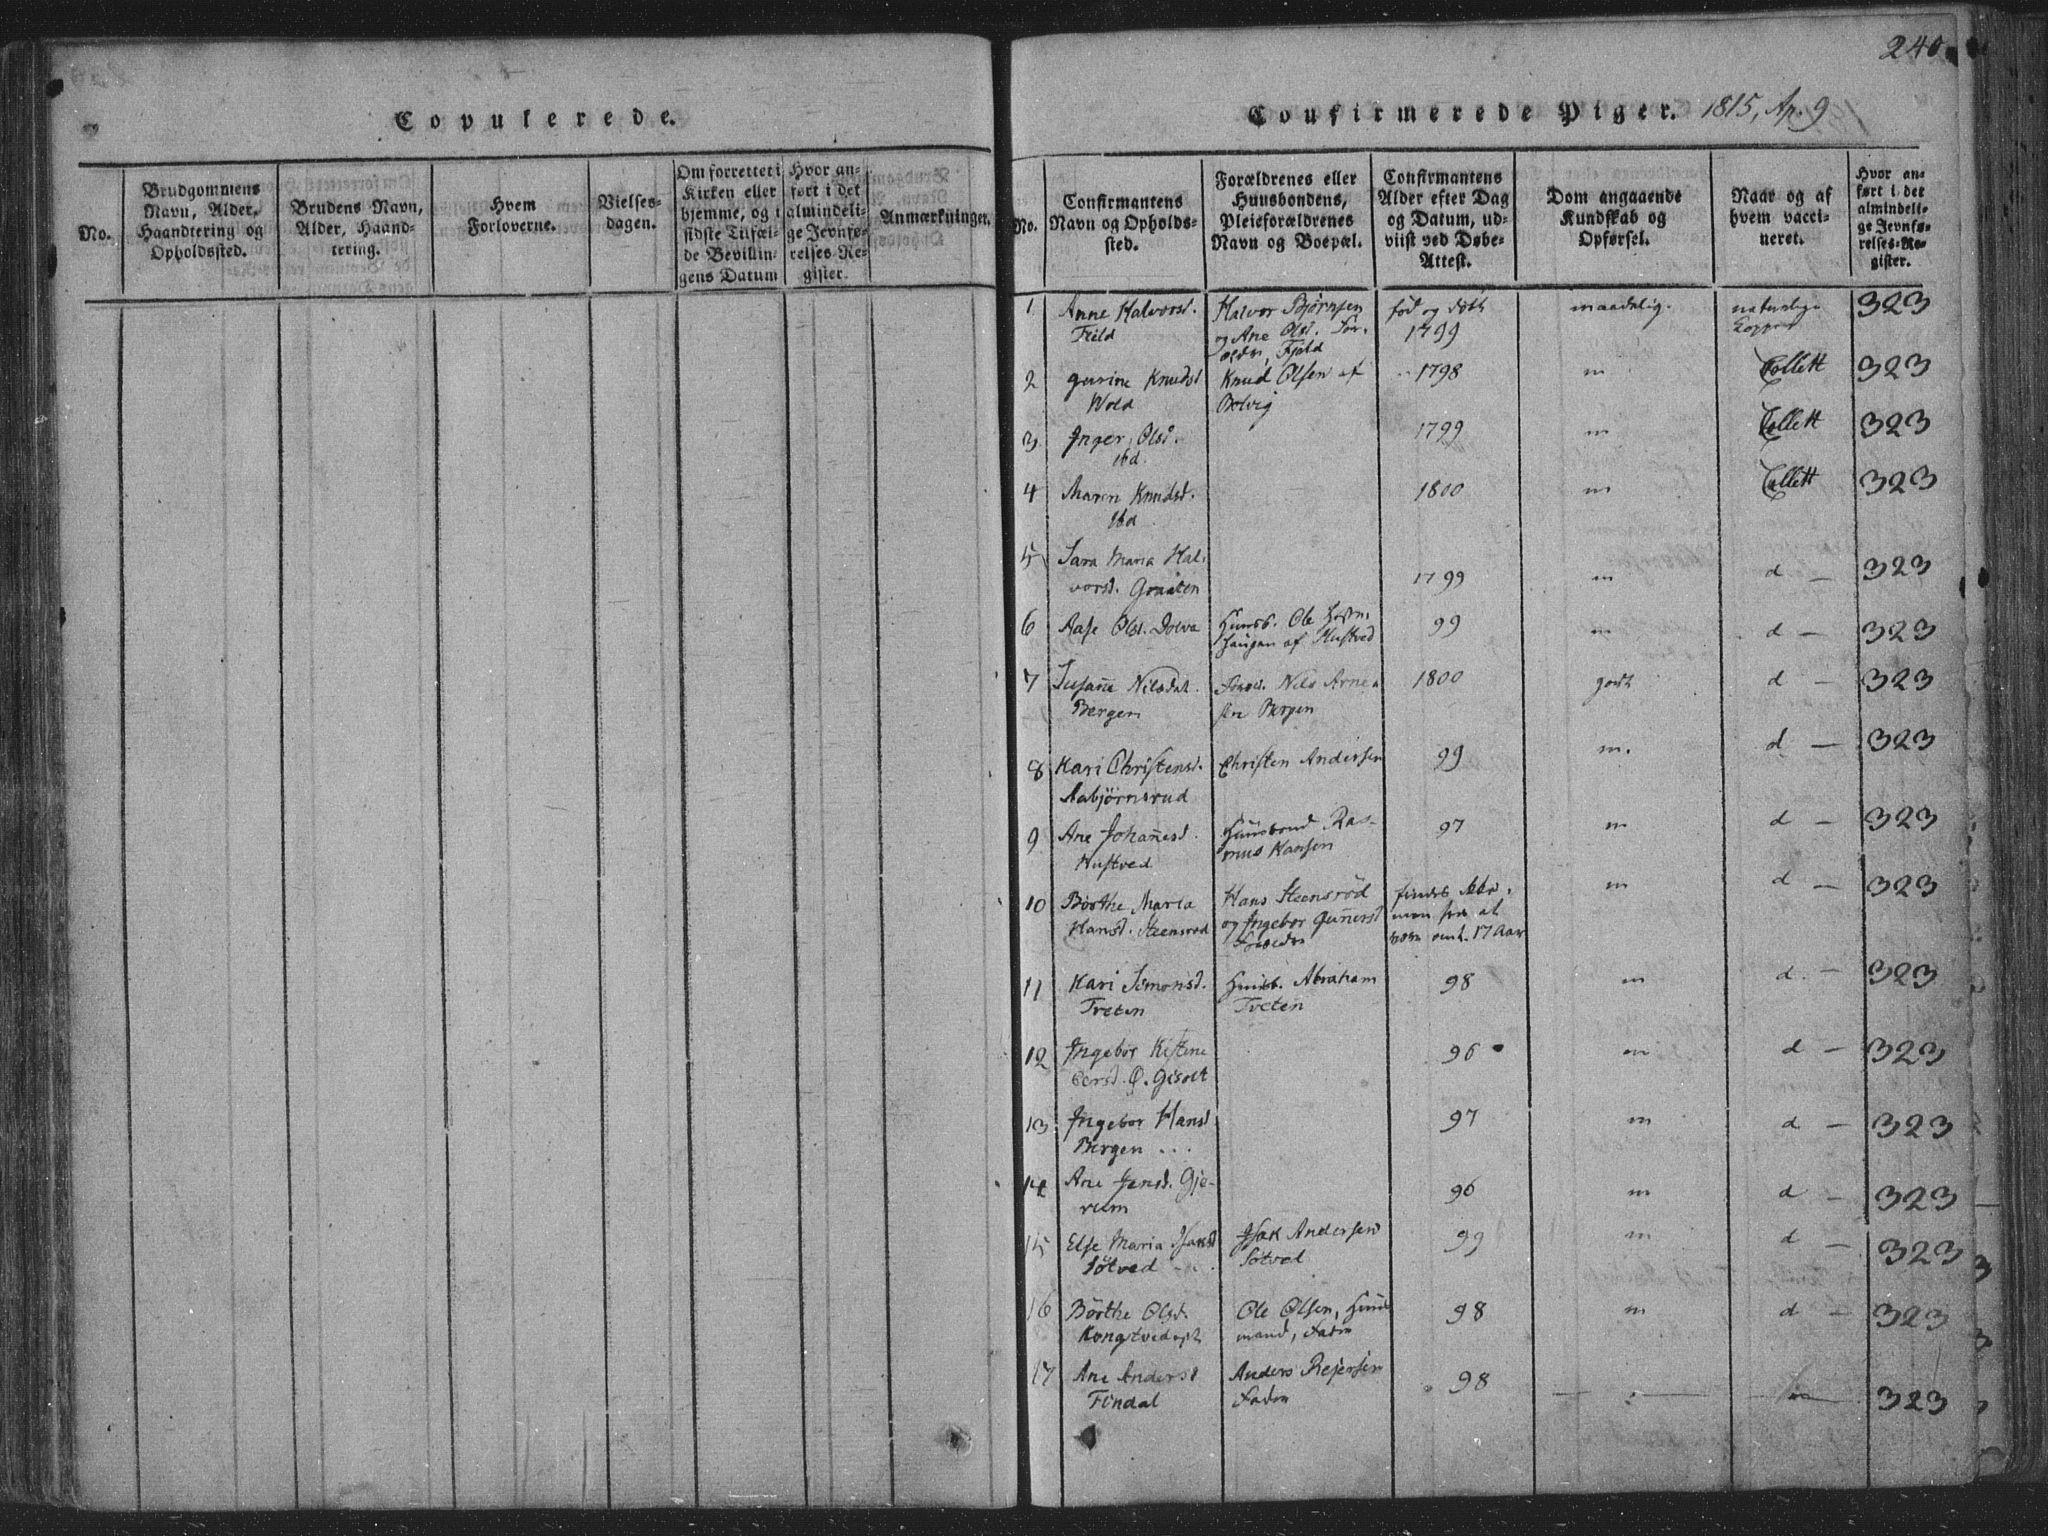 SAKO, Solum kirkebøker, F/Fa/L0004: Ministerialbok nr. I 4, 1814-1833, s. 240